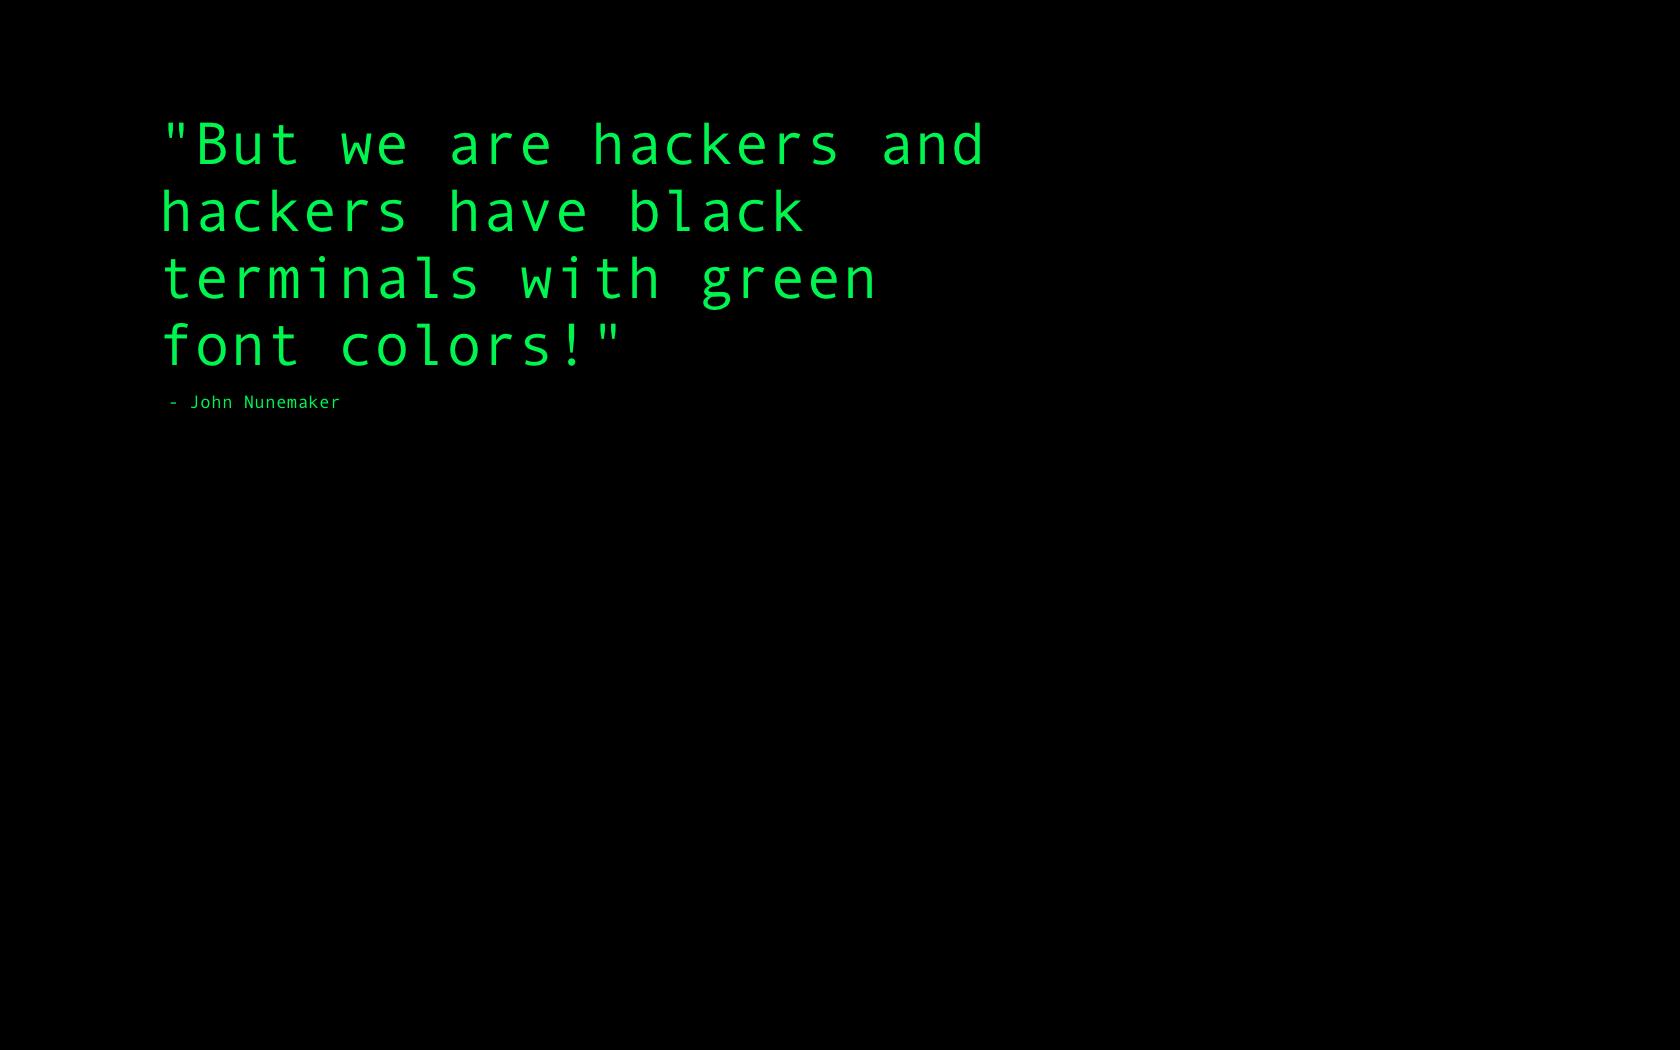 Hacker quote #2